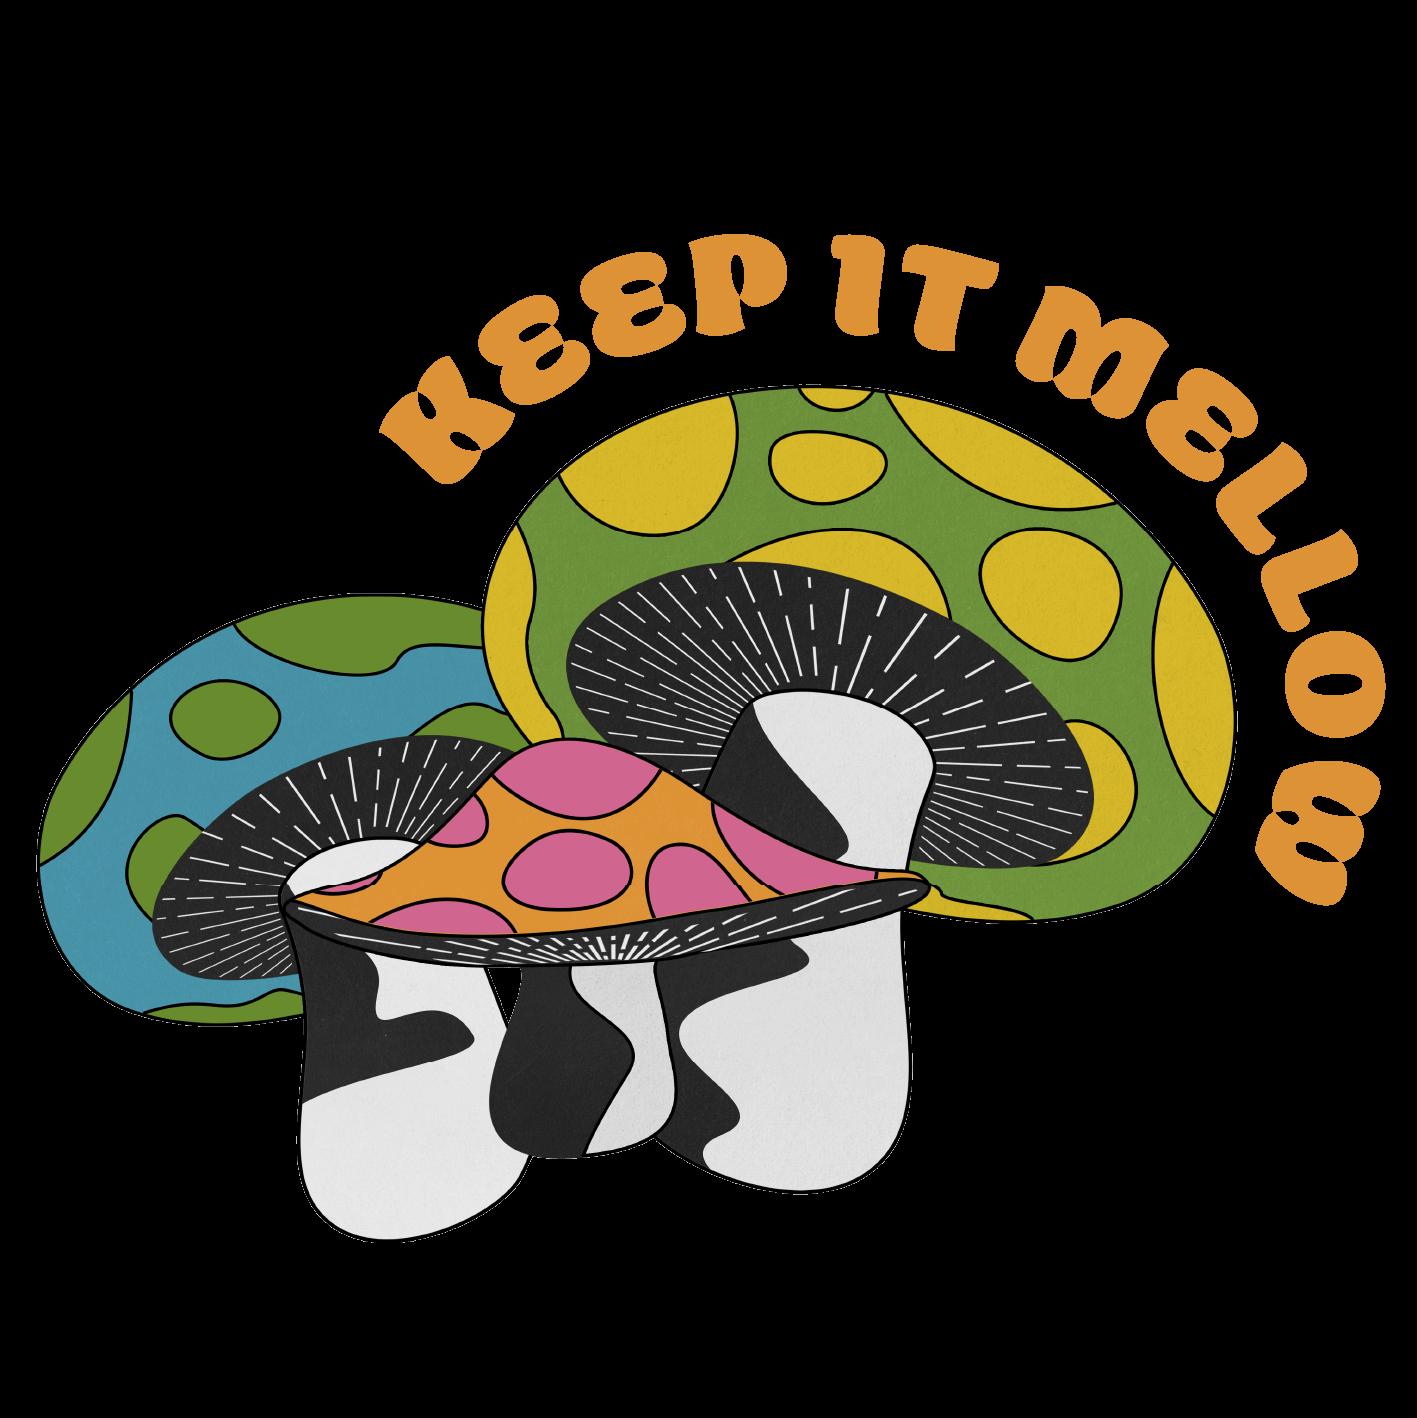 Mellow Stickers messages sticker-0